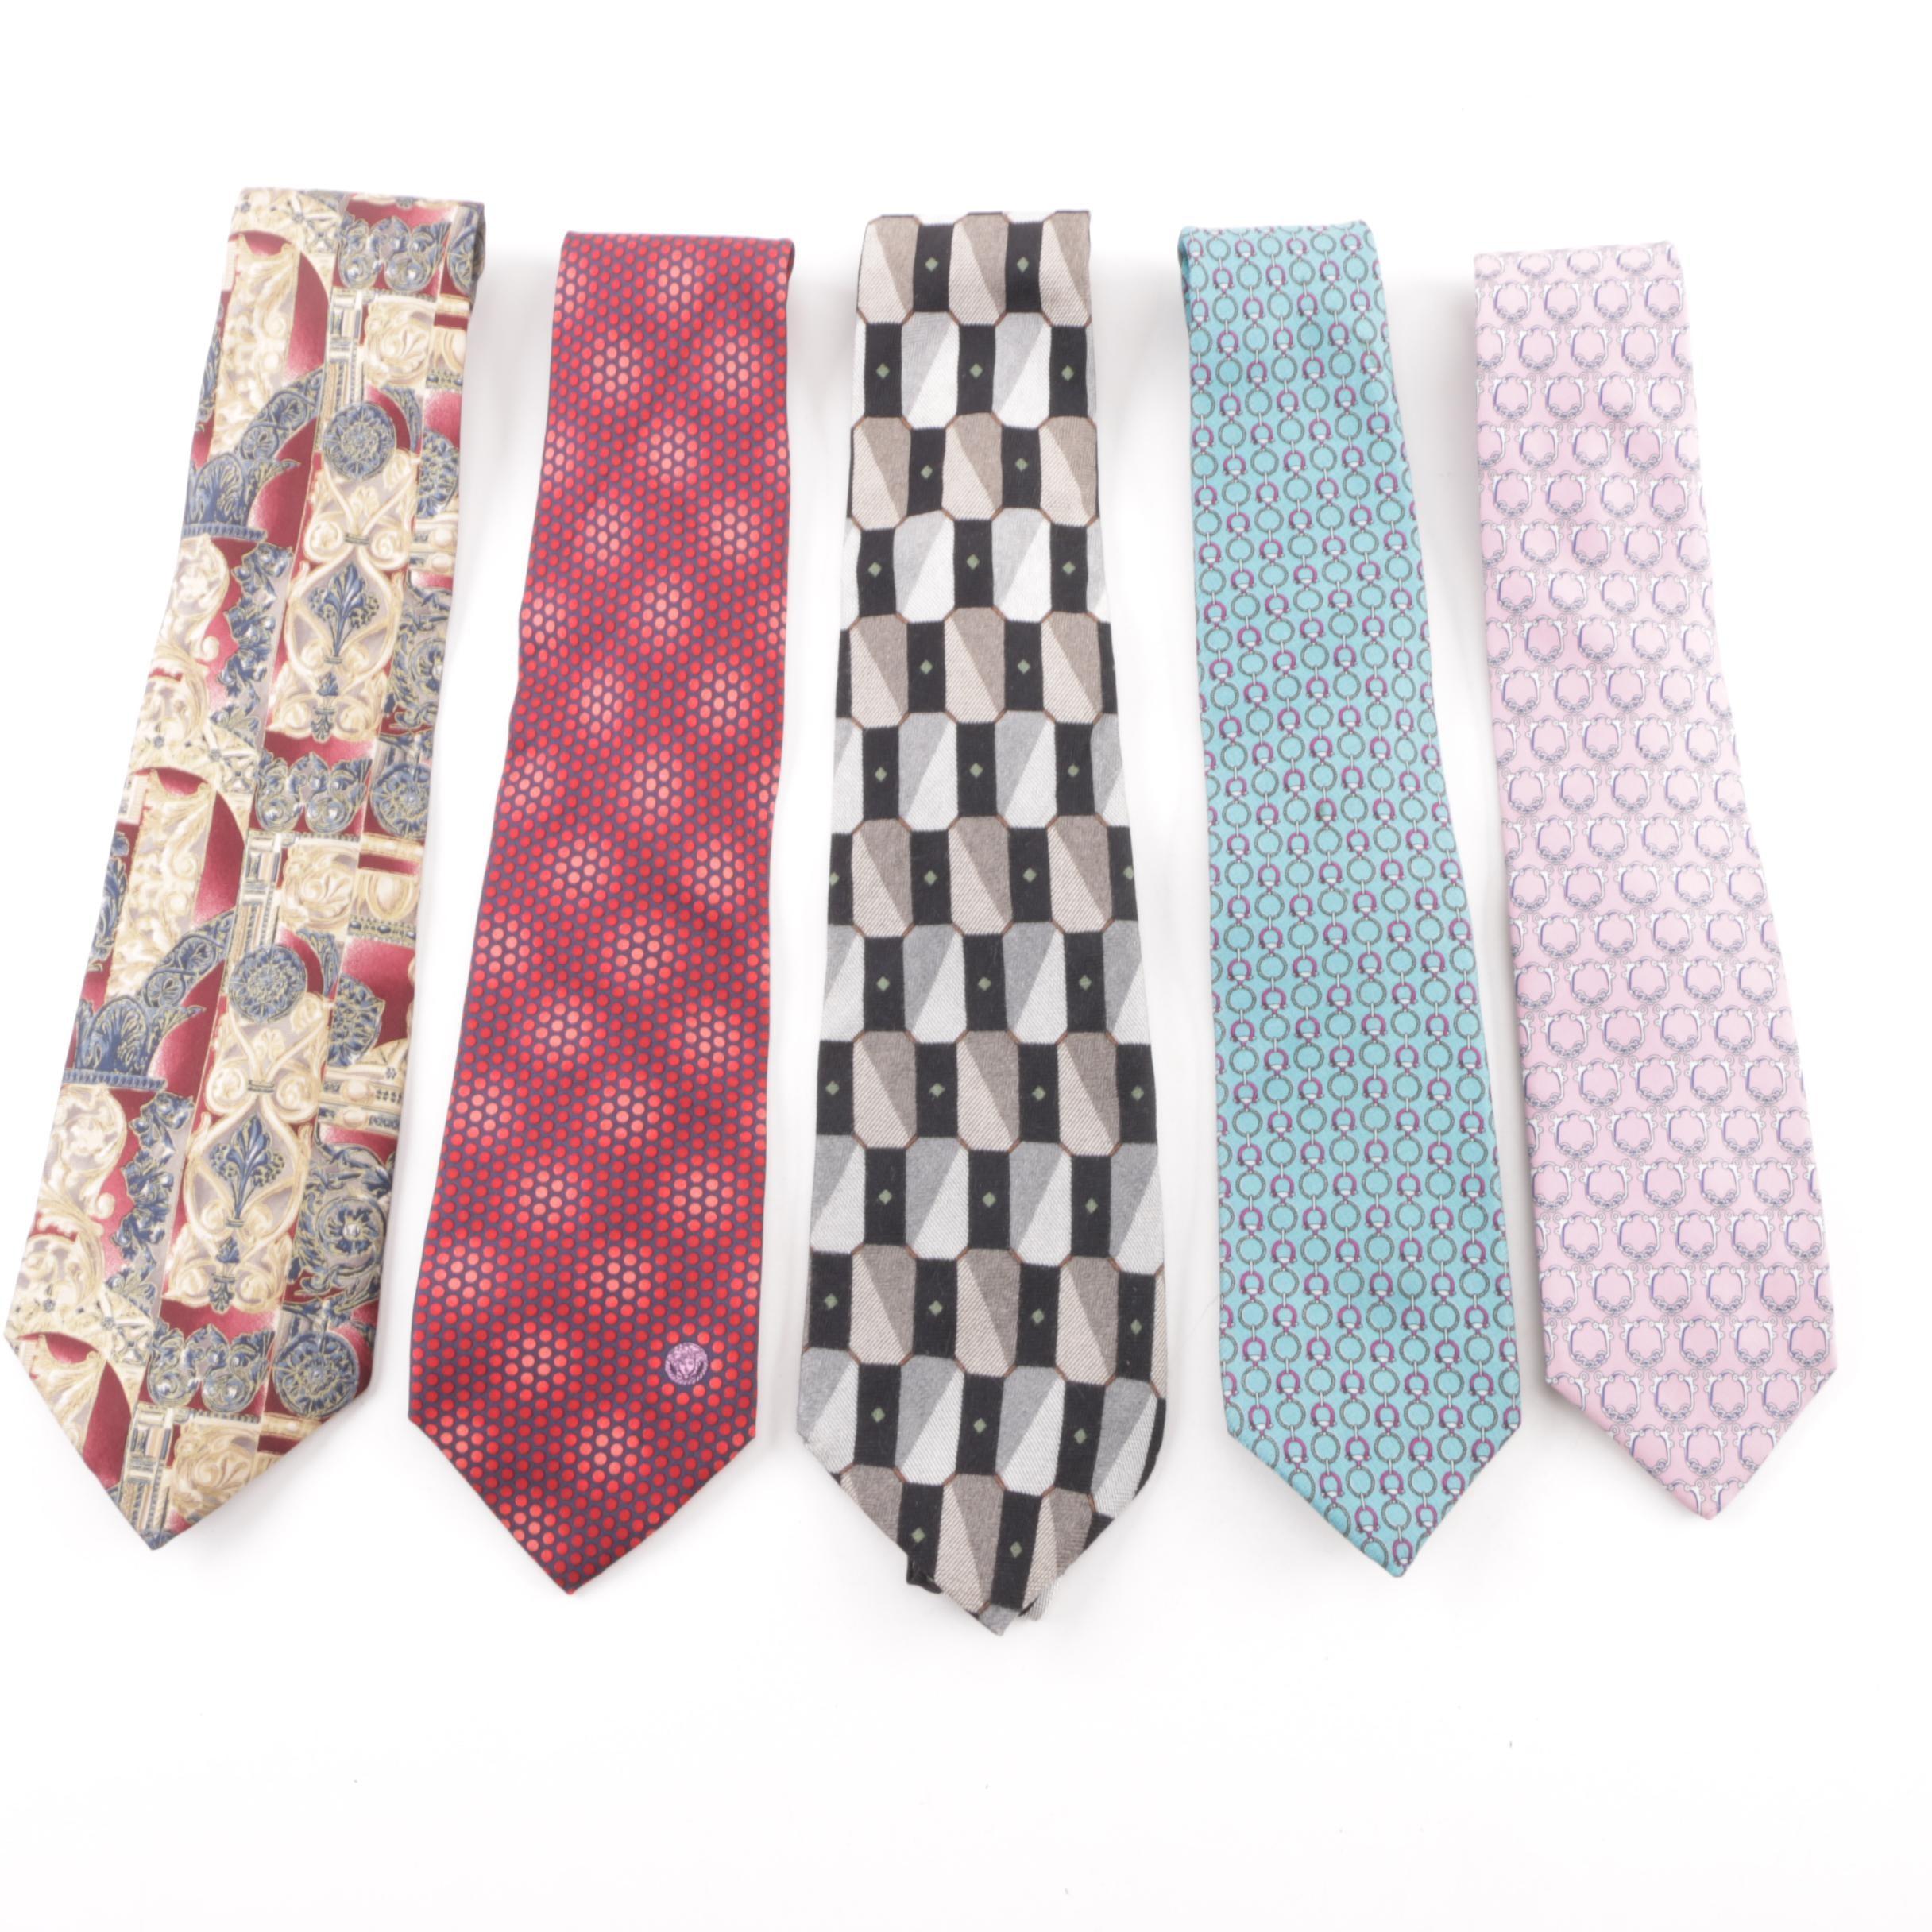 Men's Monsieur De Givenchy and Gianni Versace Silk Neckties